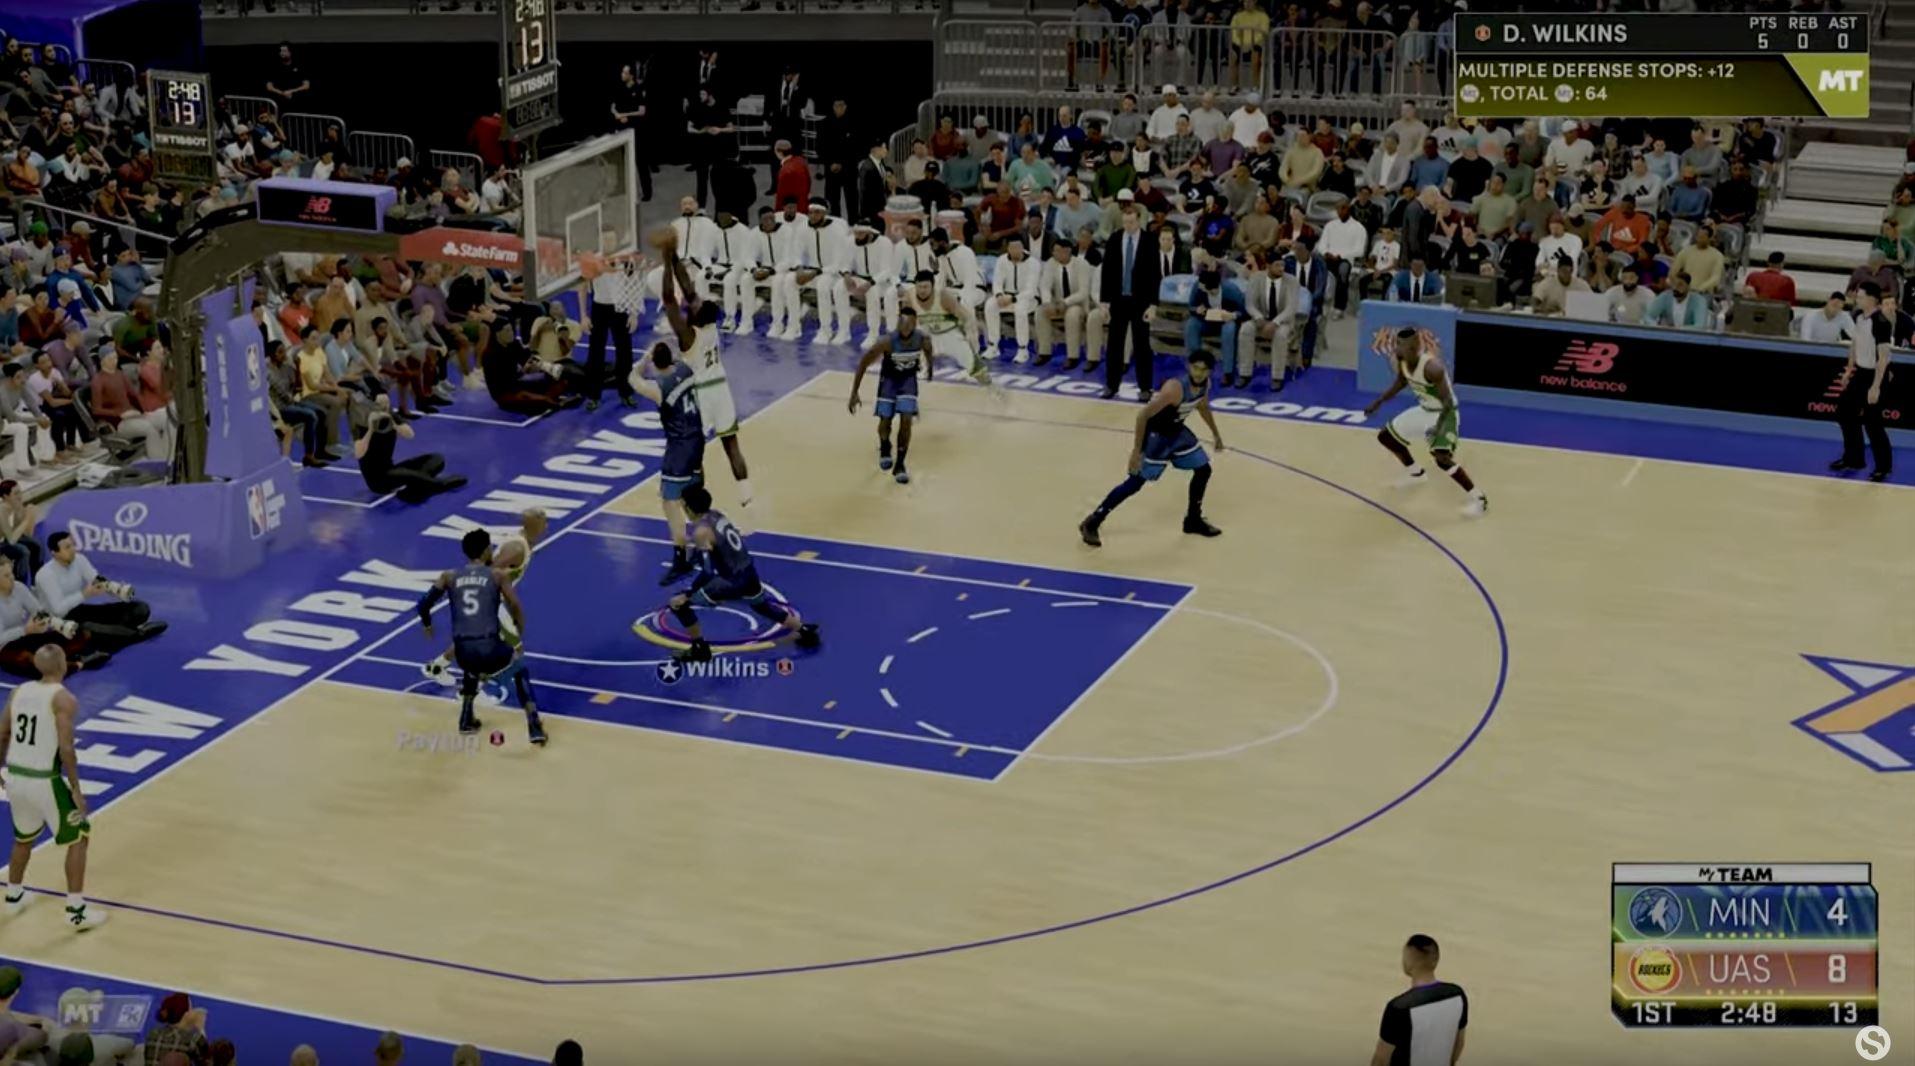 NBA 2K22 PnR 6